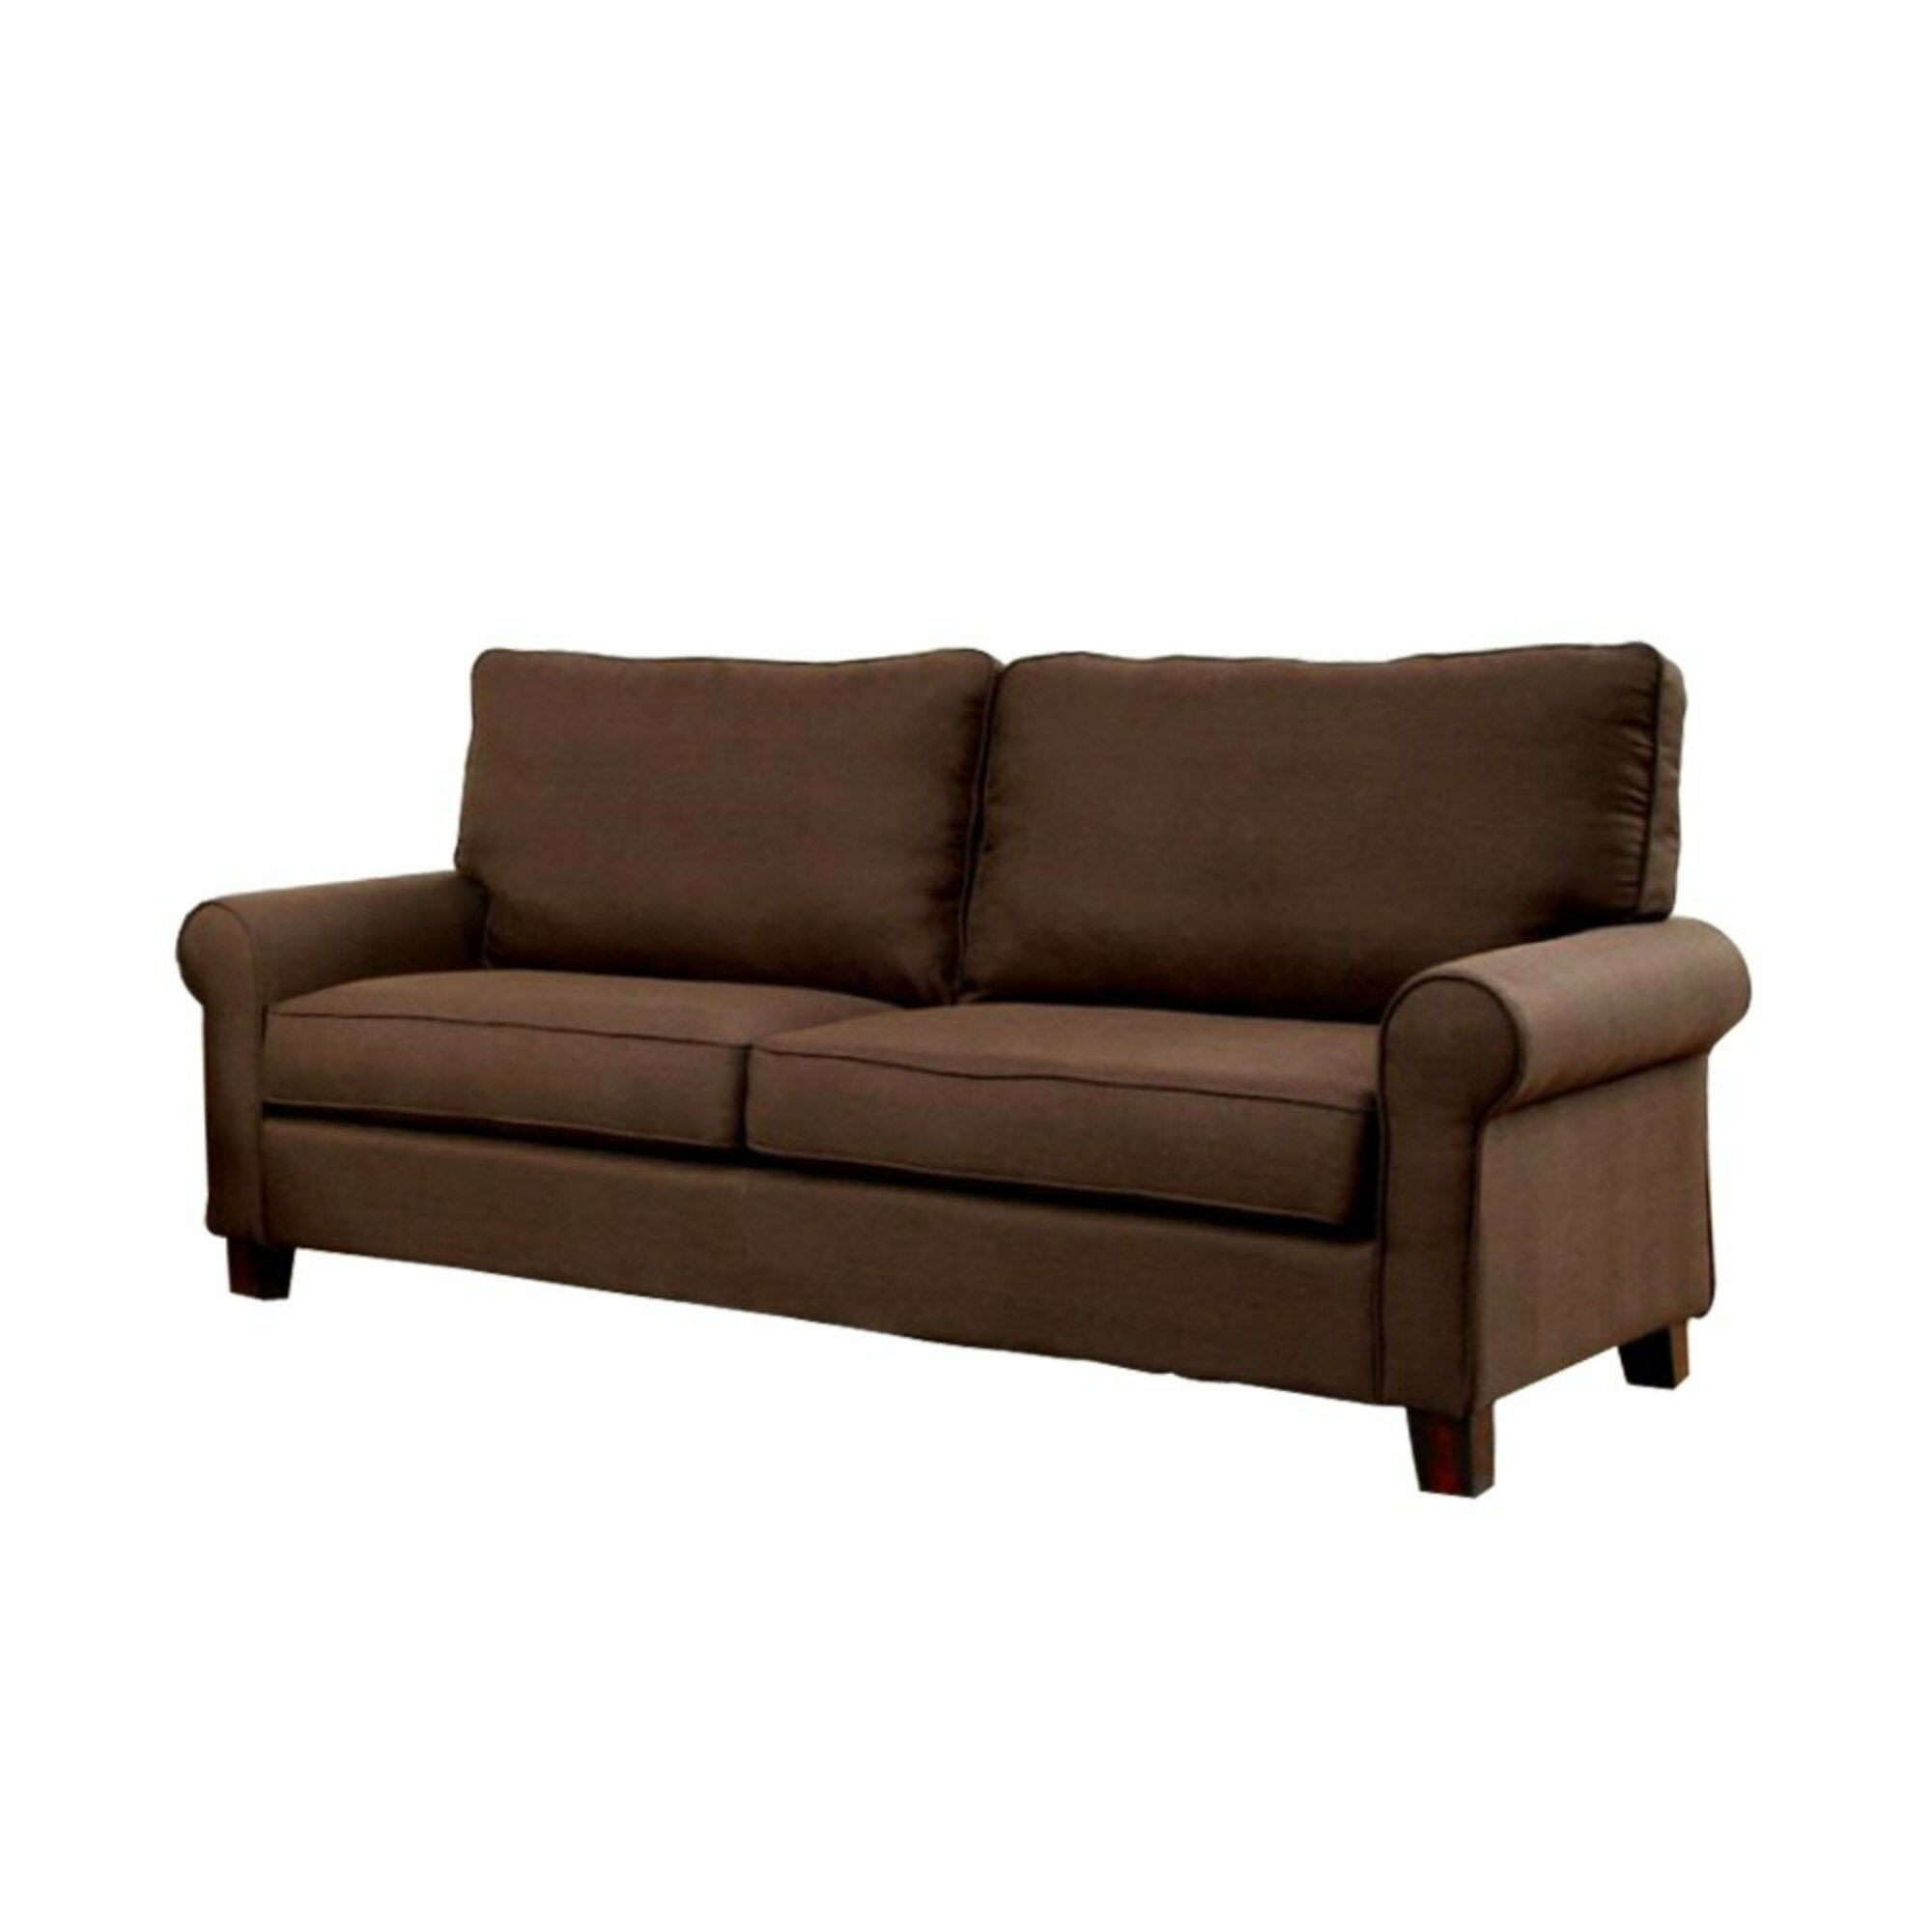 Hani Flax Fabric Sofa